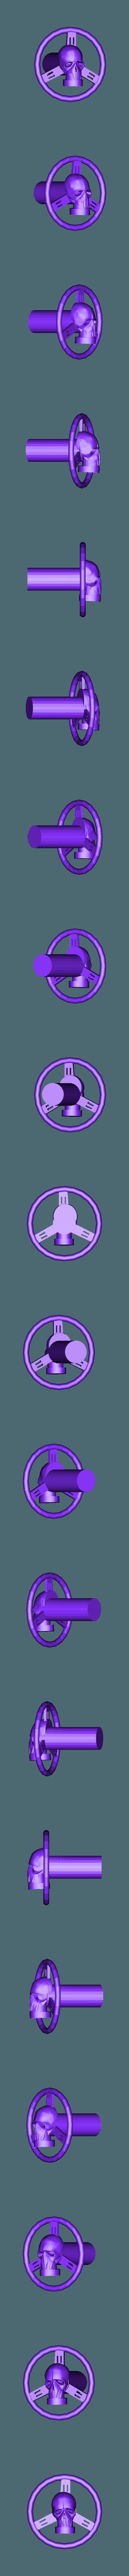 volent.stl Download STL file Fury road hotrod bodyshell 1/10 • 3D printing design, RCGANG93